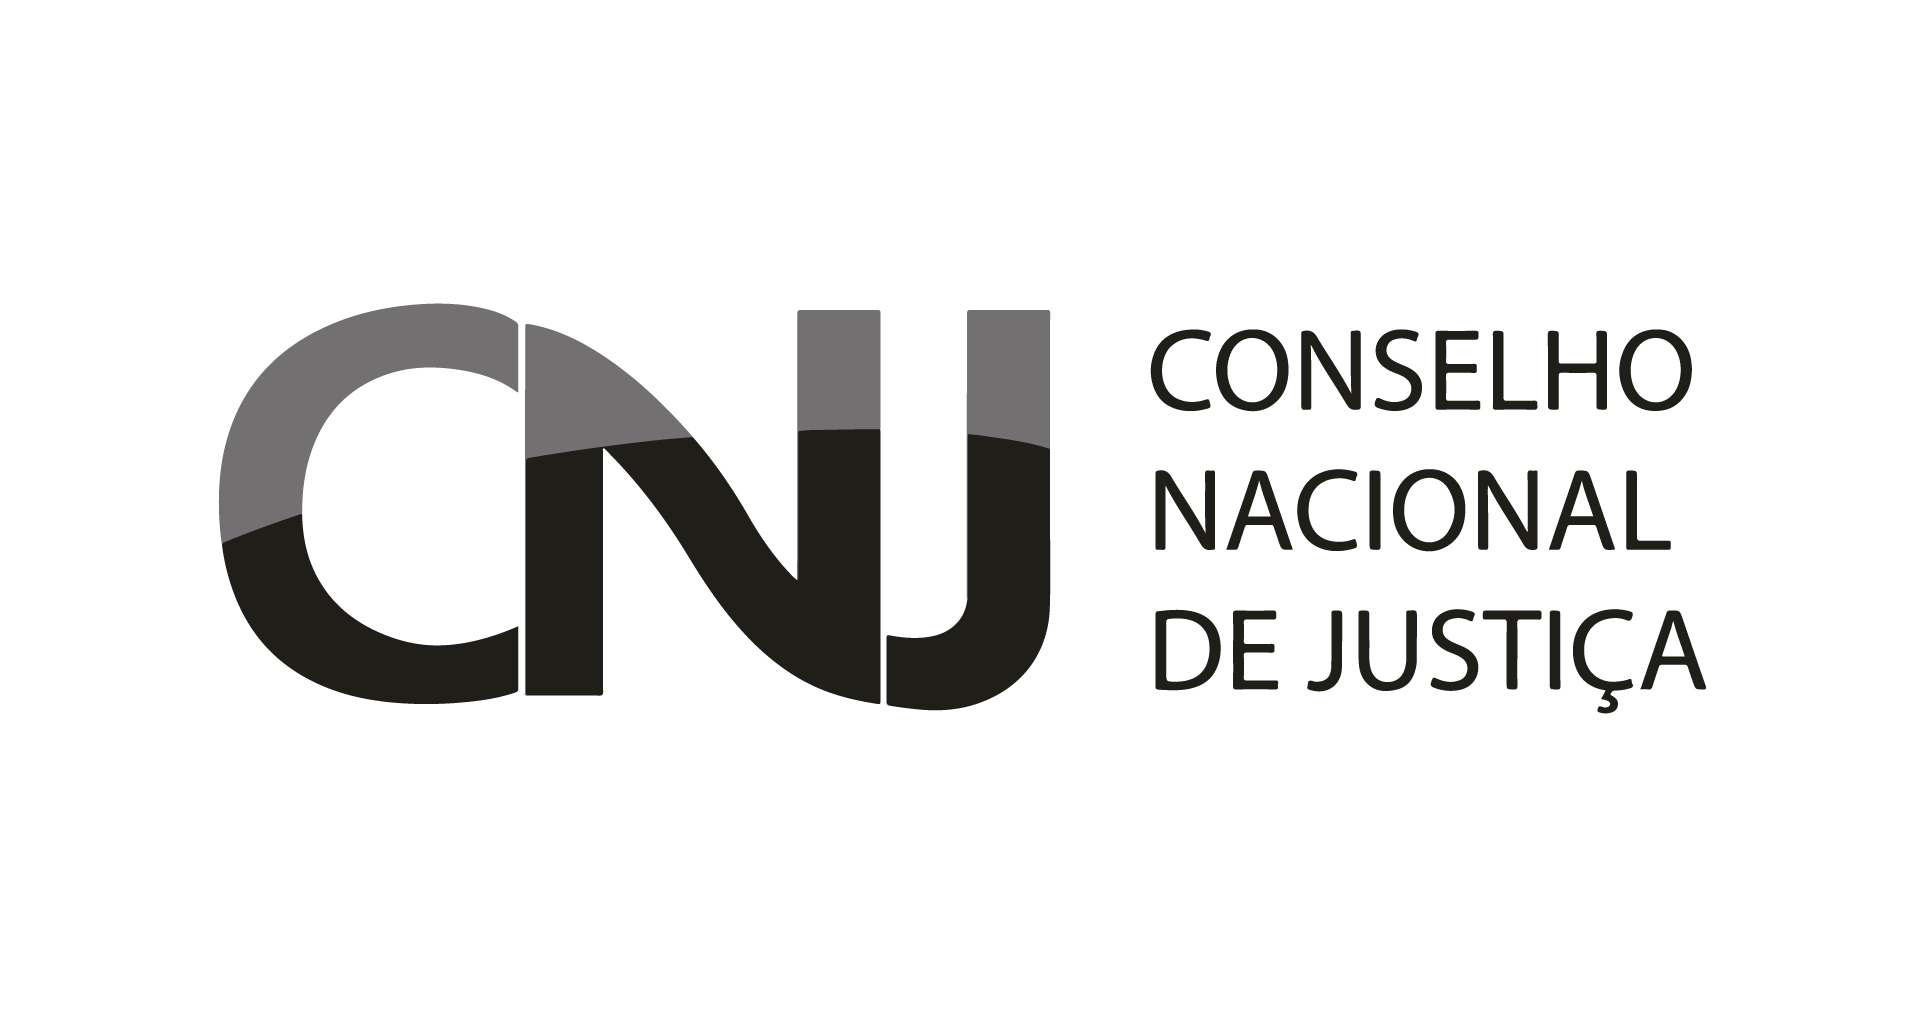 CONSELHO NACIONAL DE JUSTIÇA – CNJ